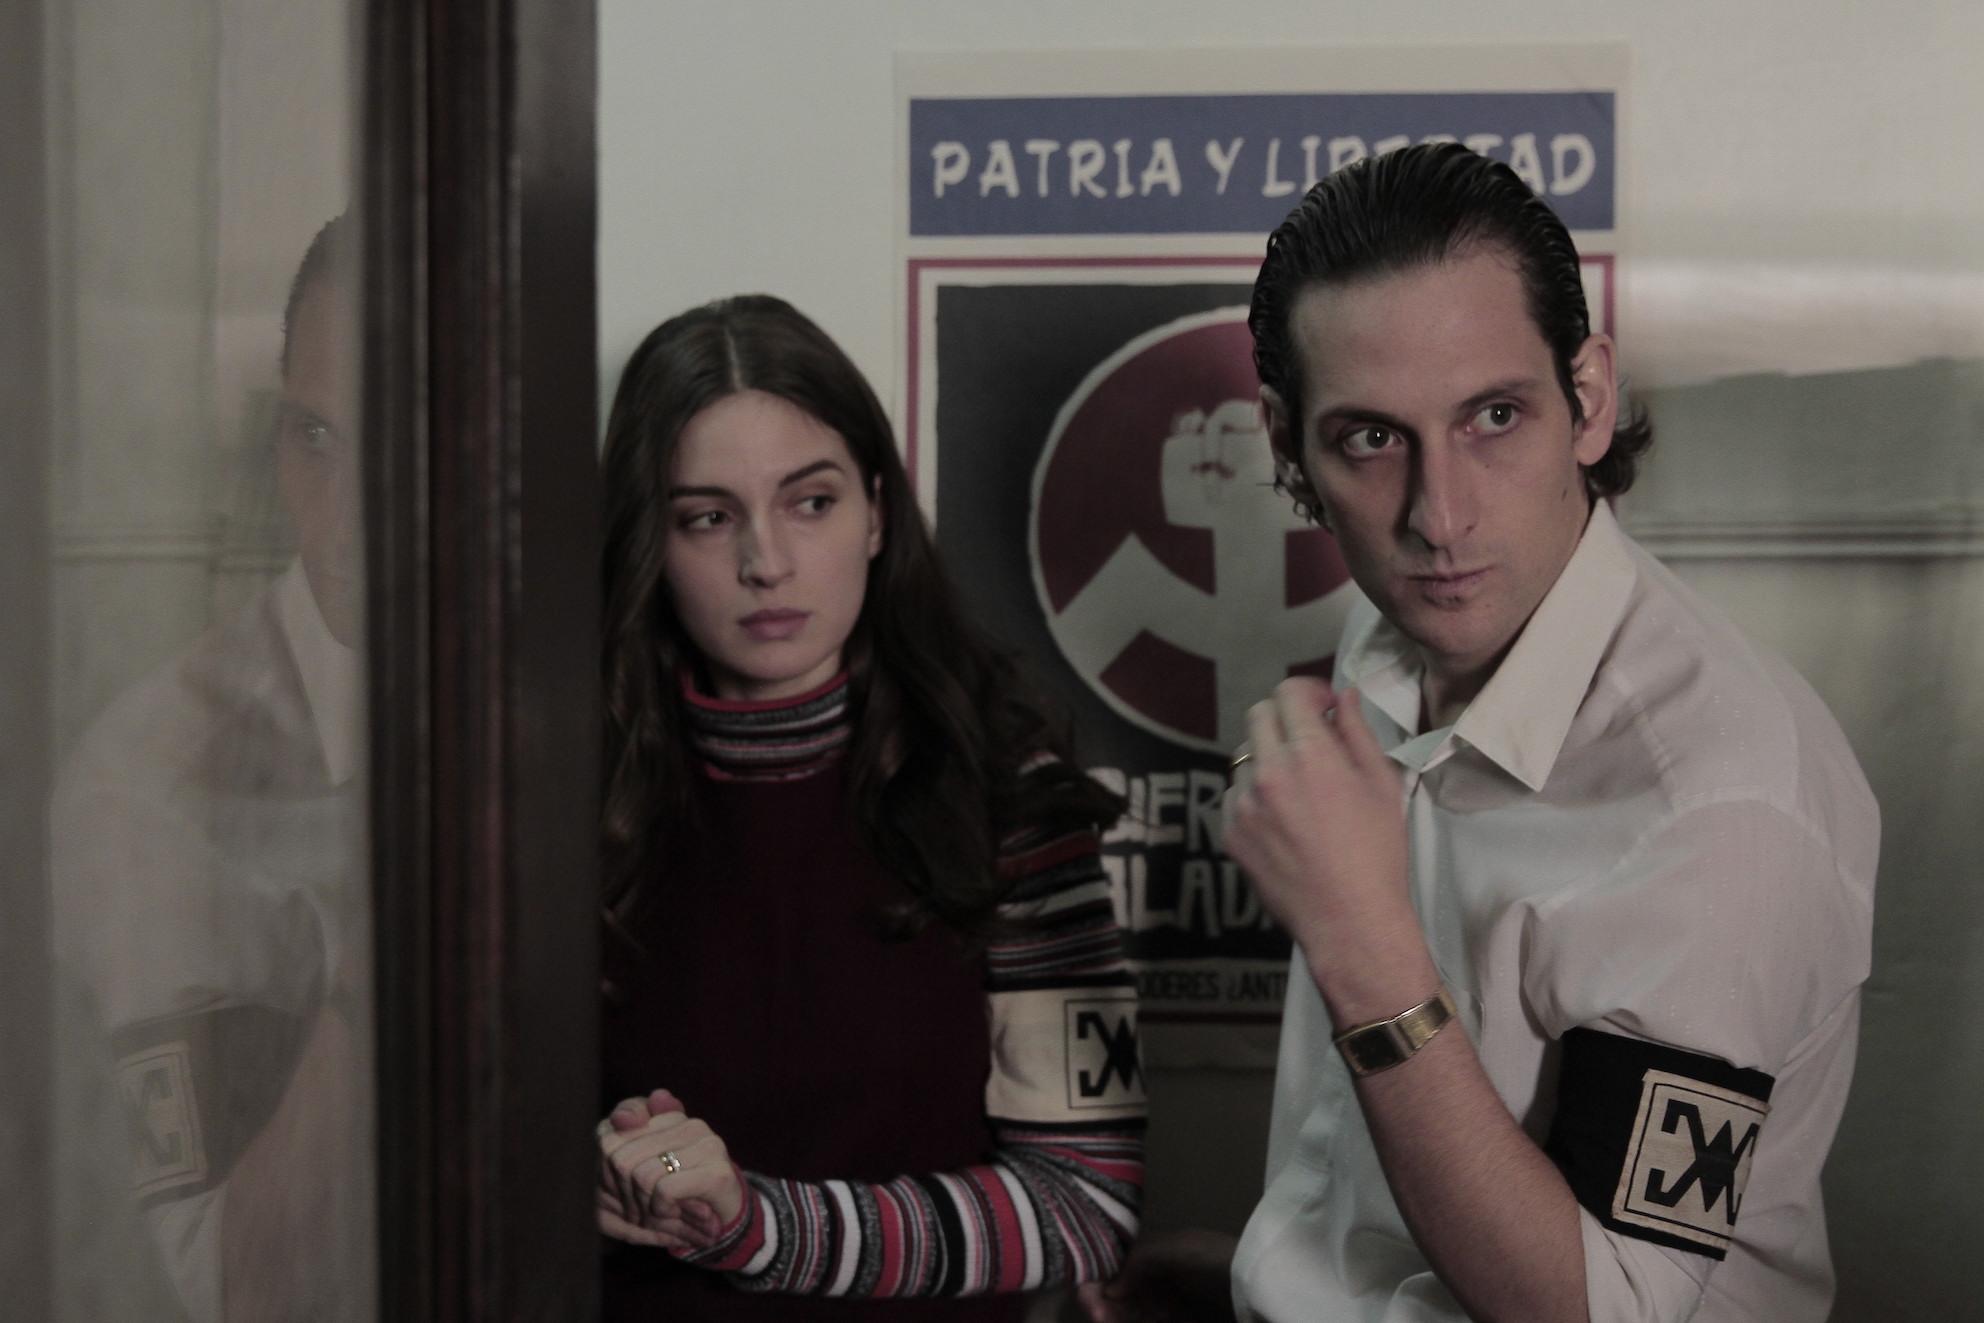 {focus_keyword} Proiecții în aer liber la a 5-a ediție Película 9-13 septembrie 2020, la Cinema Elvire Popesco b0c76266 abc7 427b b885 1bcb42ec497b